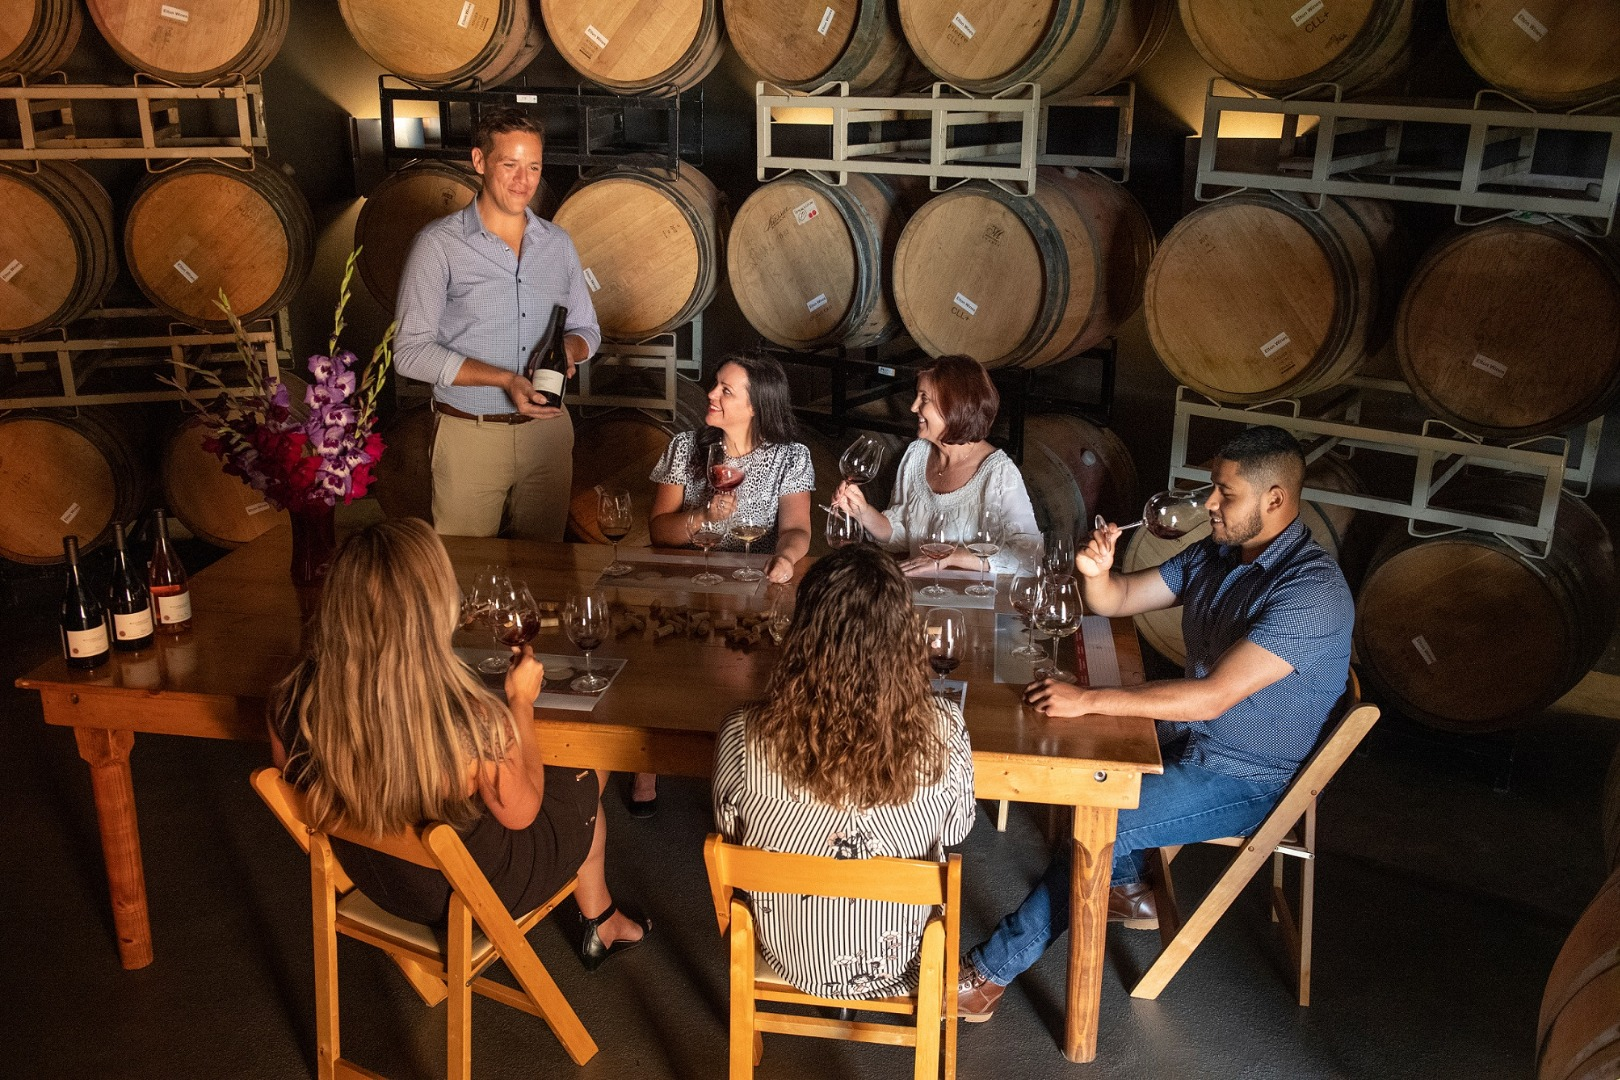 Seated-Tasting-in-Barrel-Cellar_Willamette-Valley-Vineyards_Photo-by-Andrea-Johnson.jpg